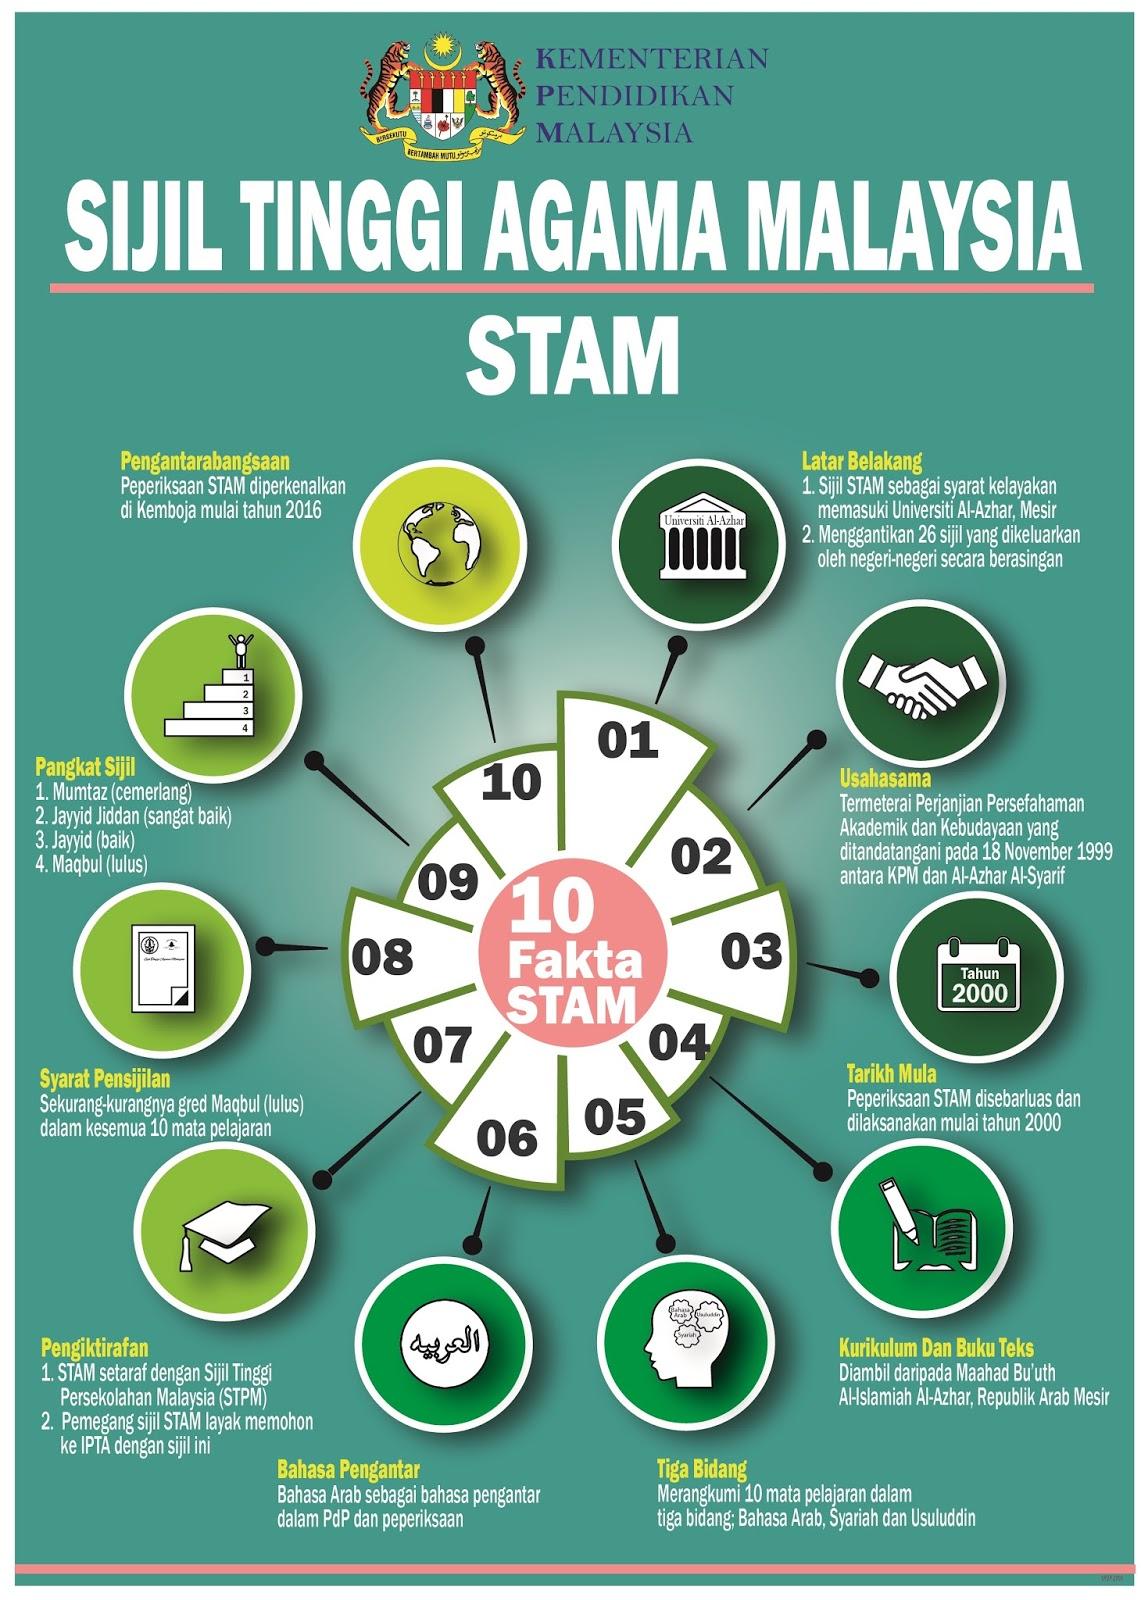 Informasi lengkap Sijil Tinggi Agama Malaysia (STAM) untuk rujukan pelajar